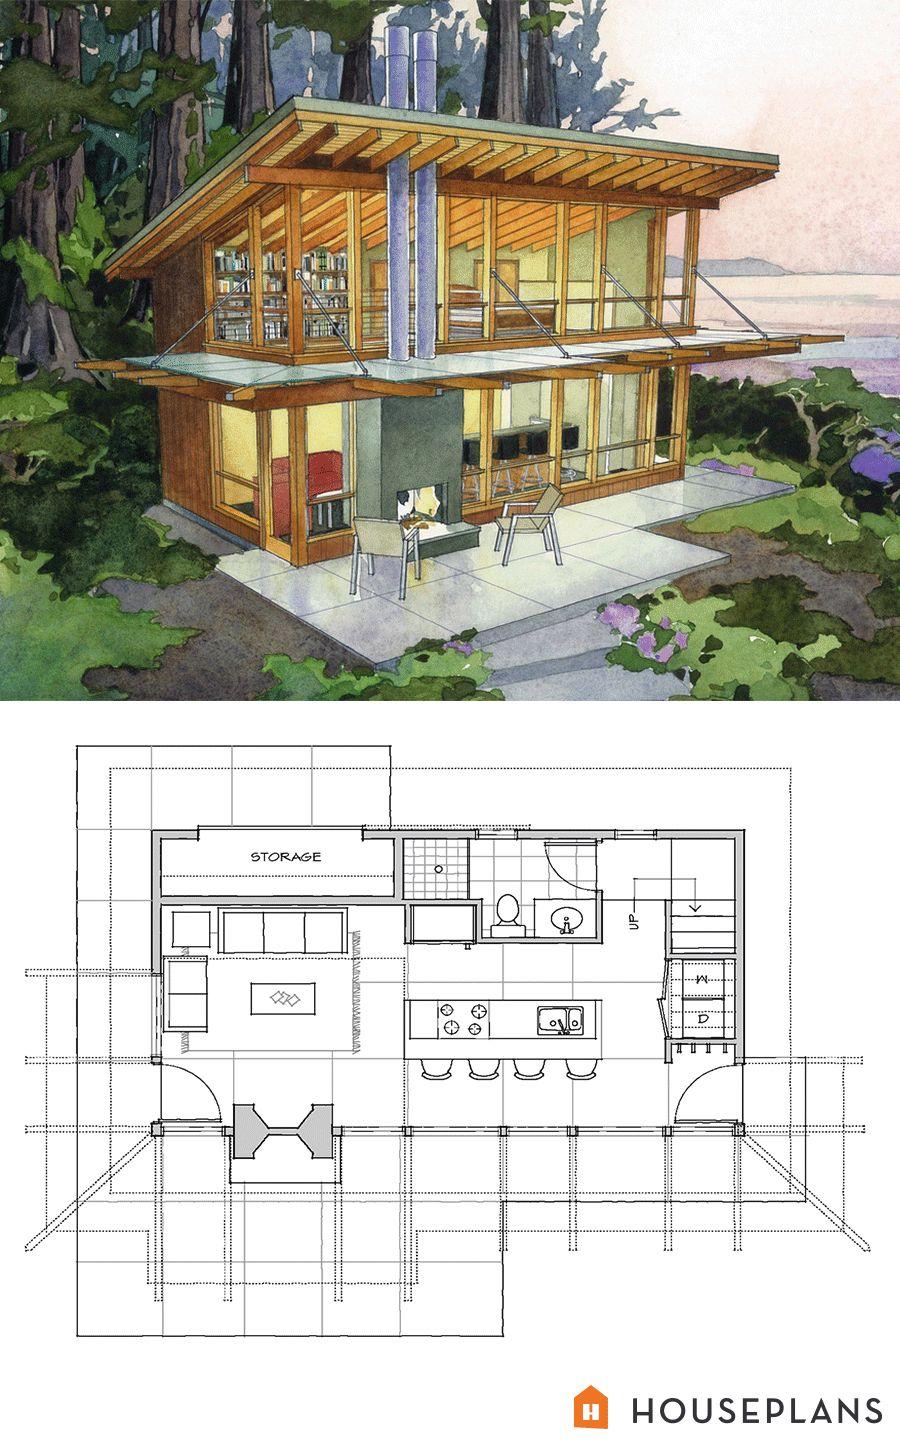 Darling Modern cabin home plan by Washington